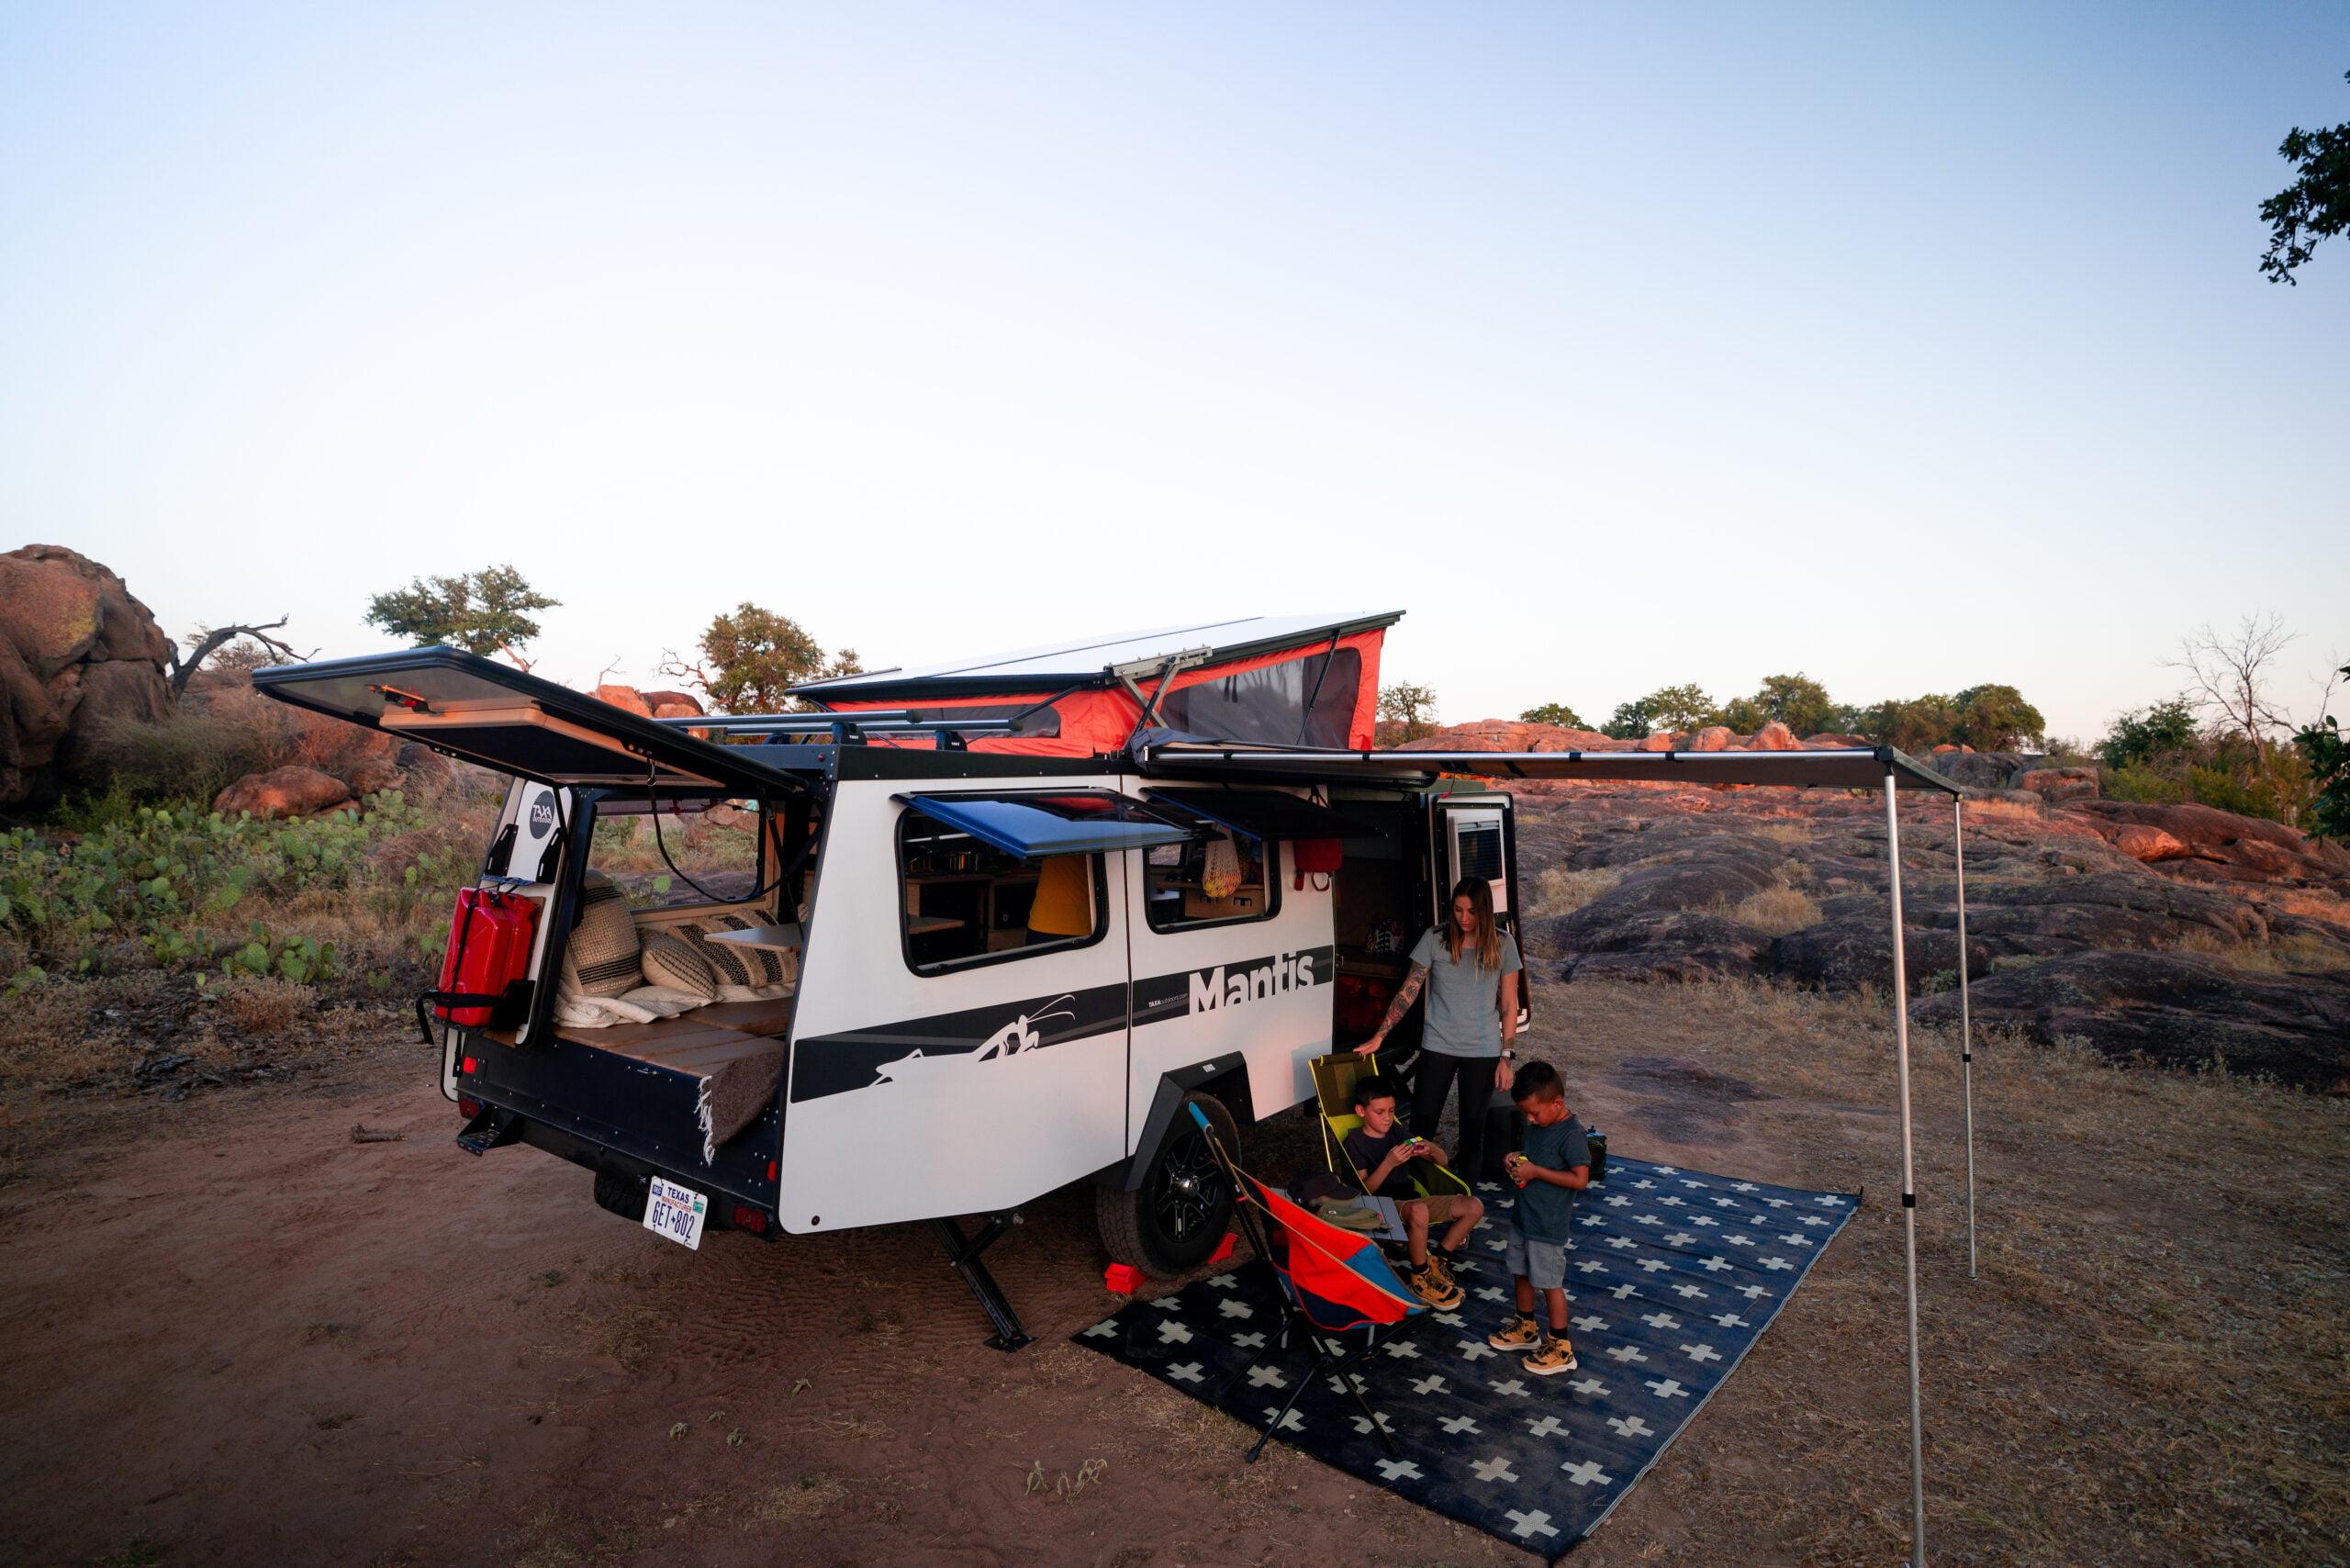 Expert Review: TAXA Mantis – the Ultimate Overlanding RV